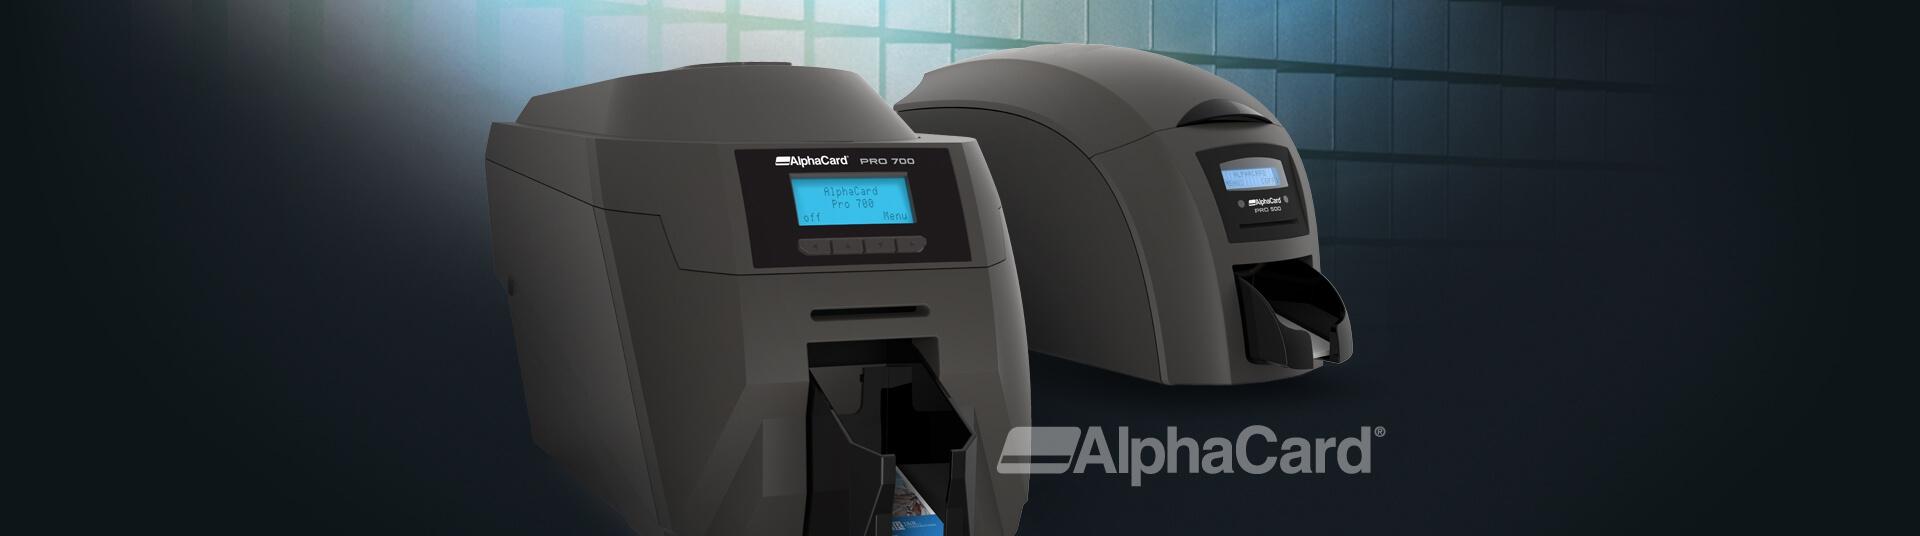 AlphaCard PRO 100